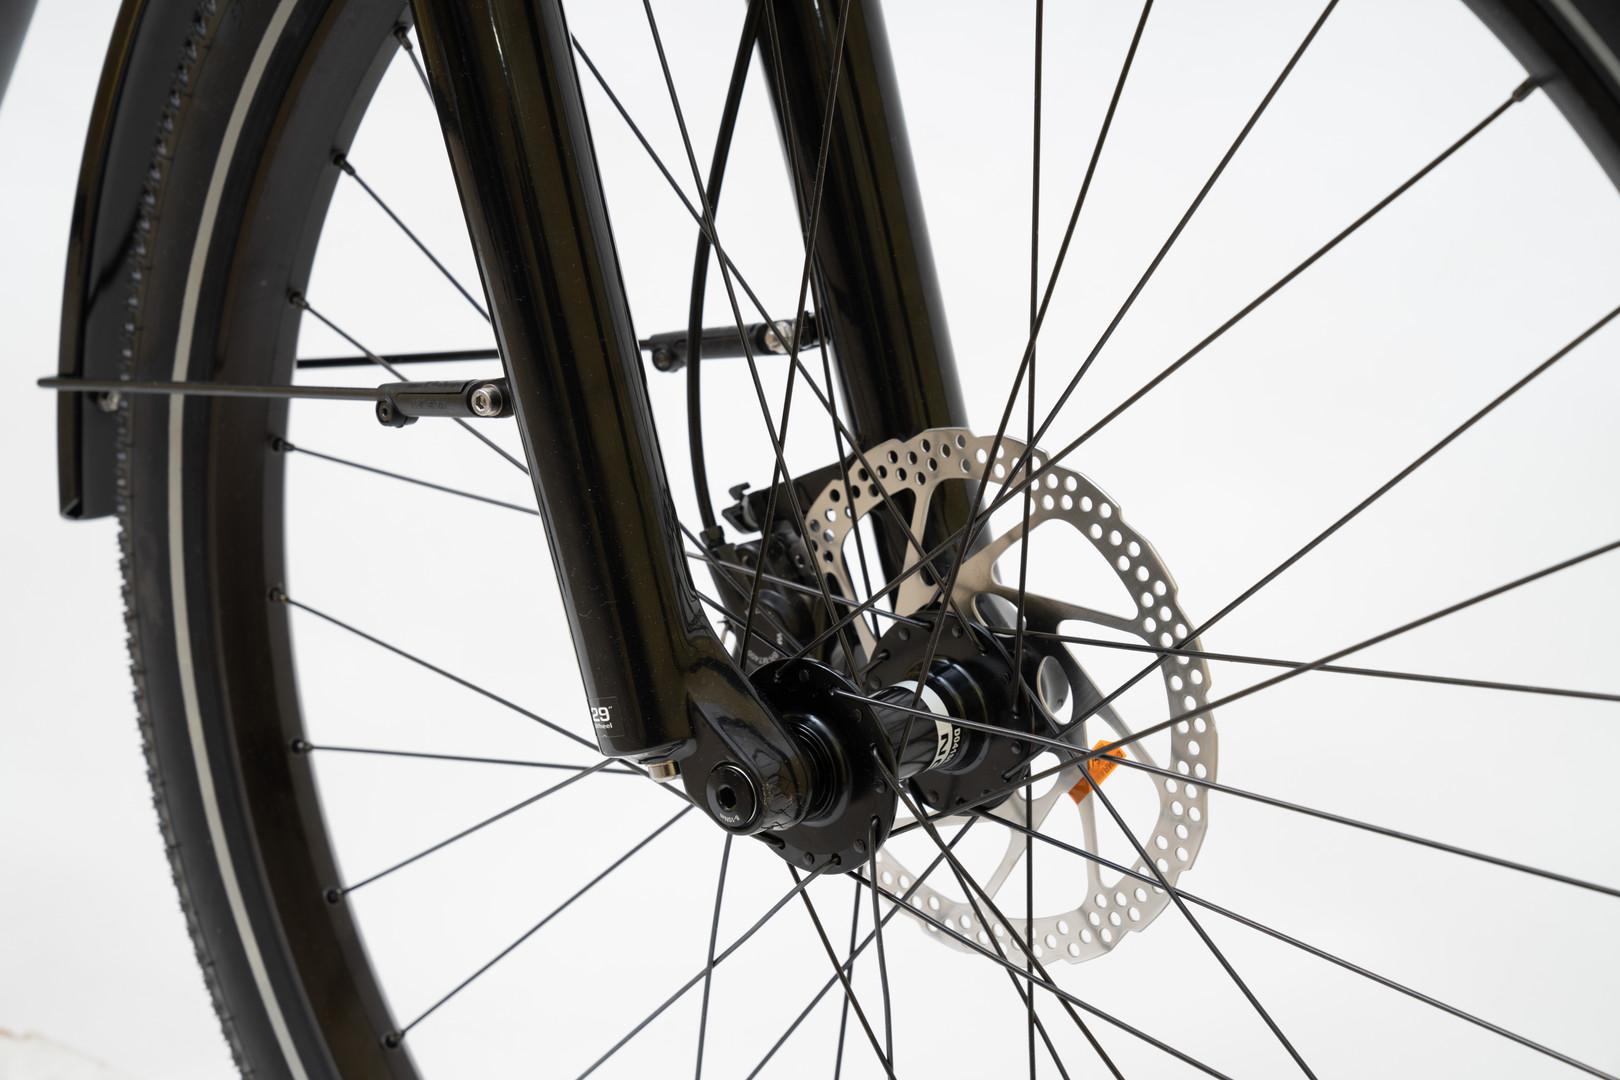 Simoes_Fahrrad_043.jpg